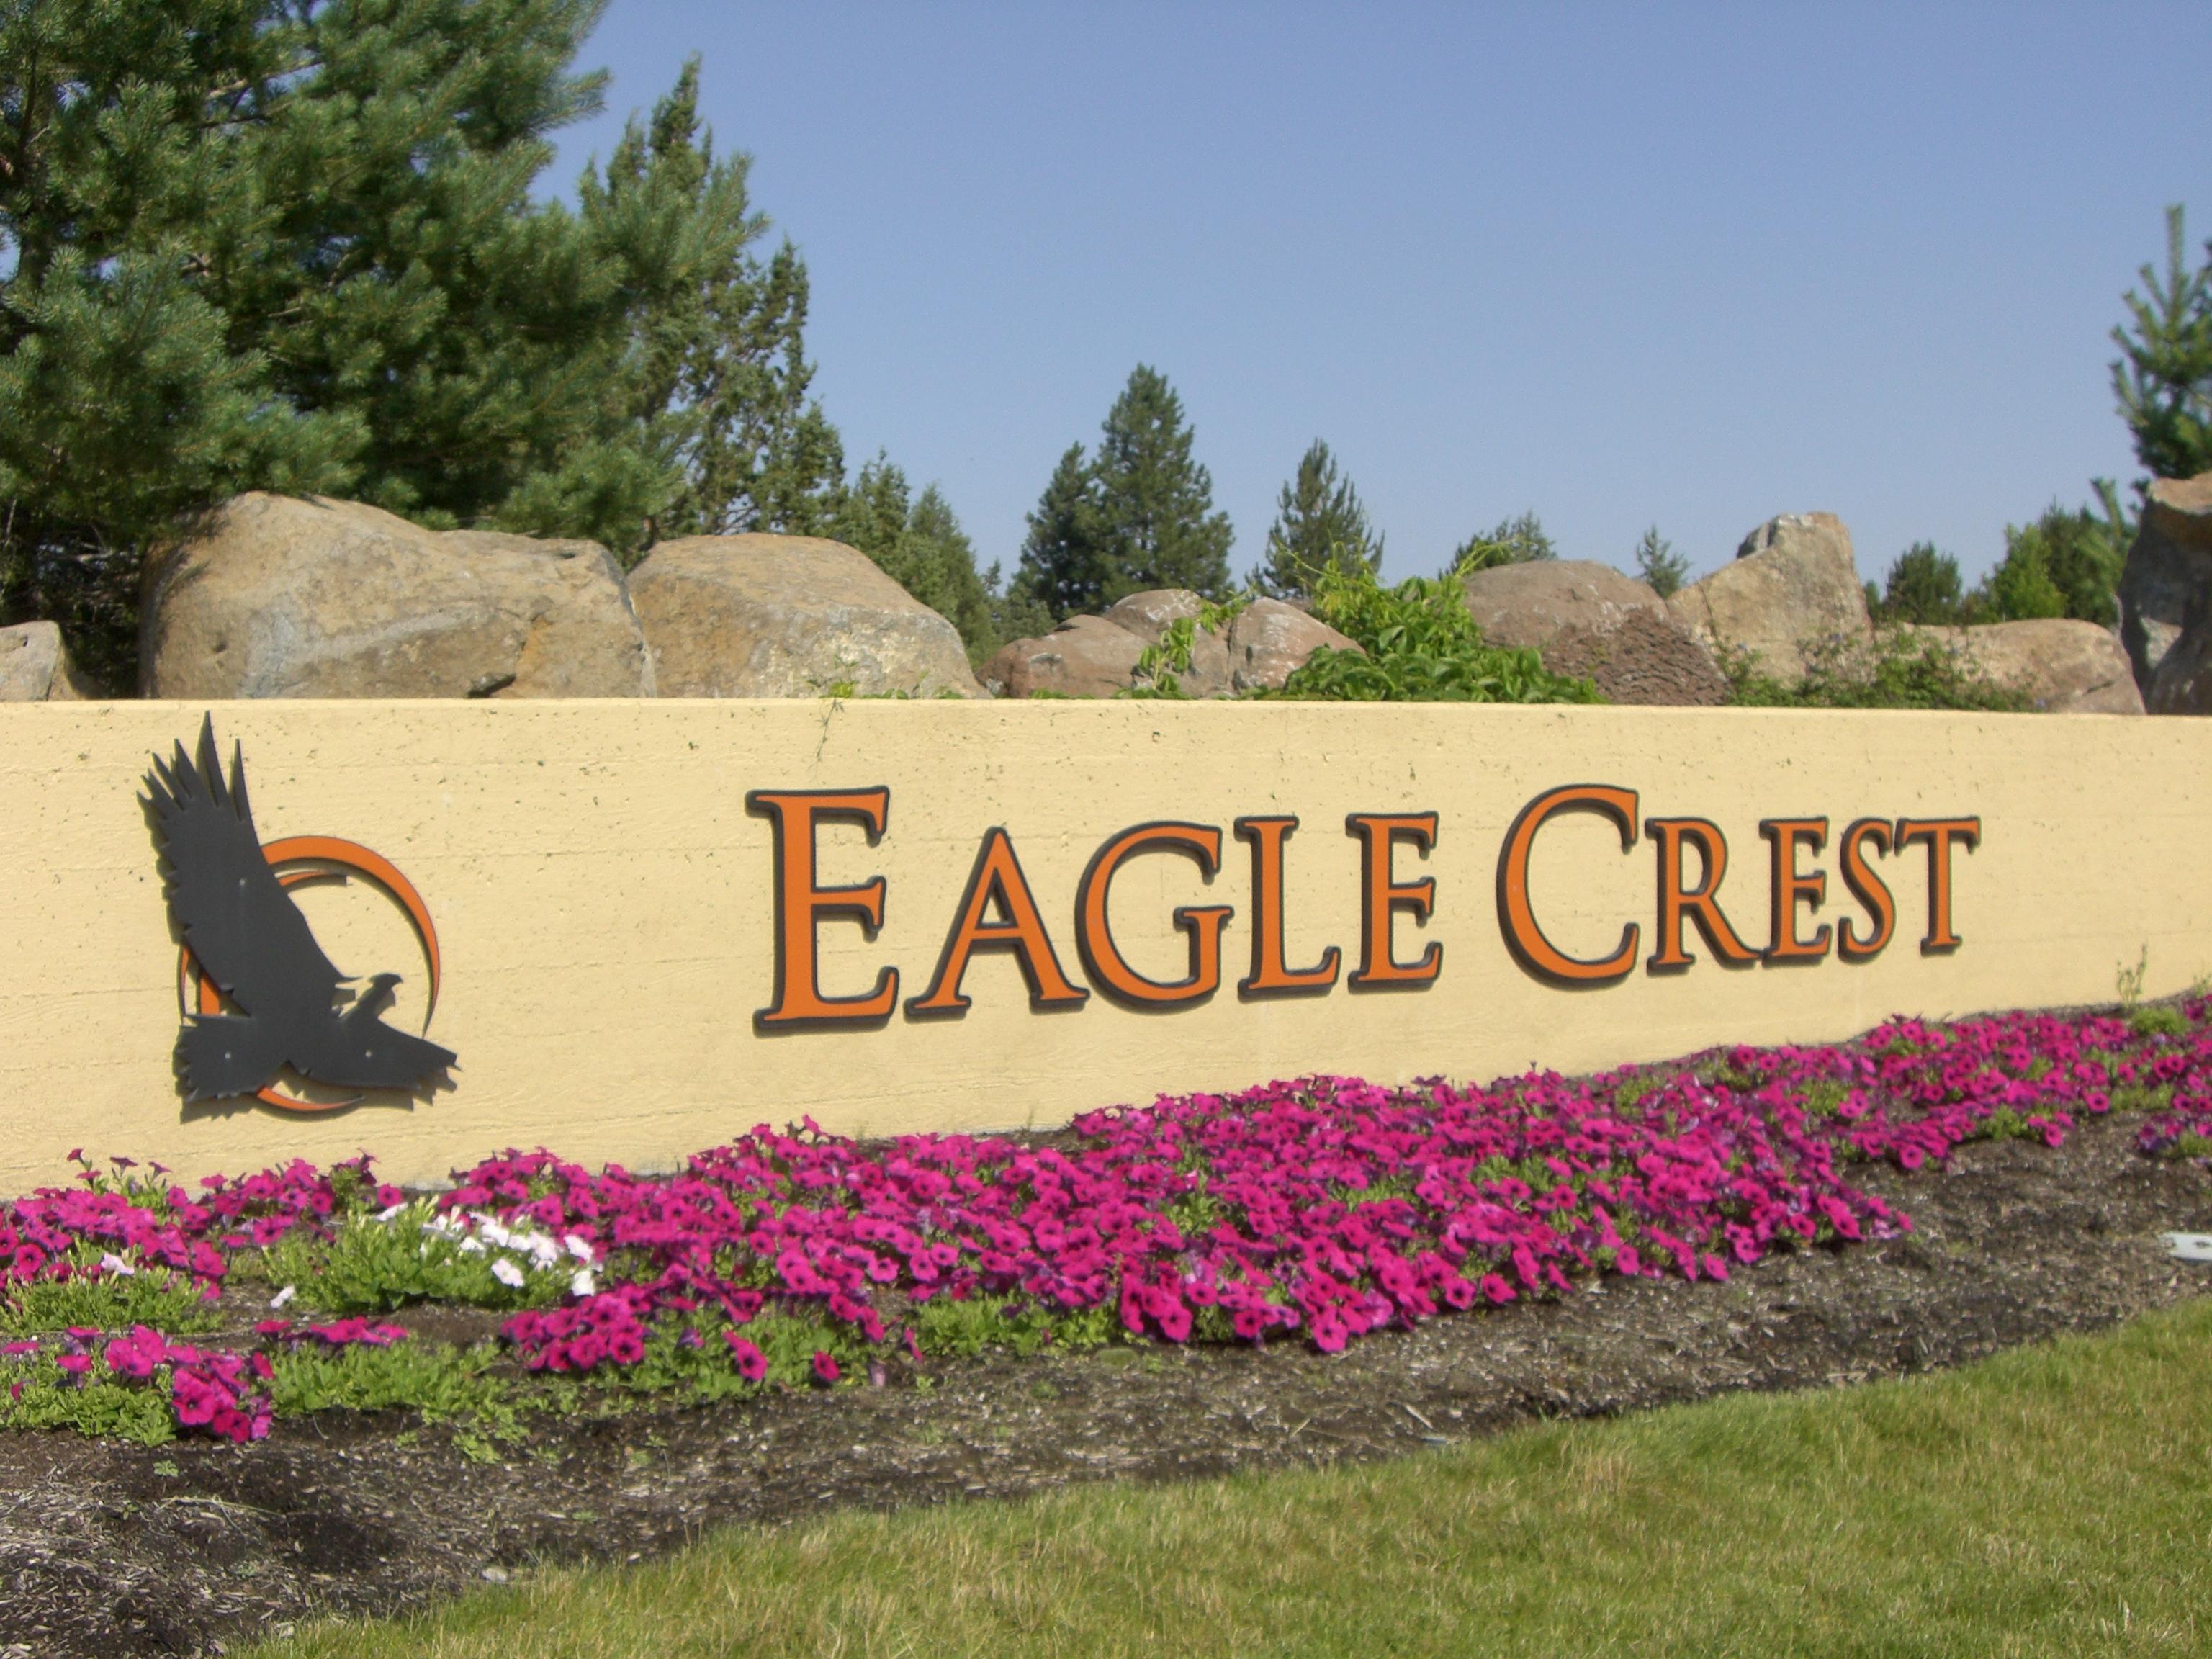 Eagle Crest Resort - Wikipedia